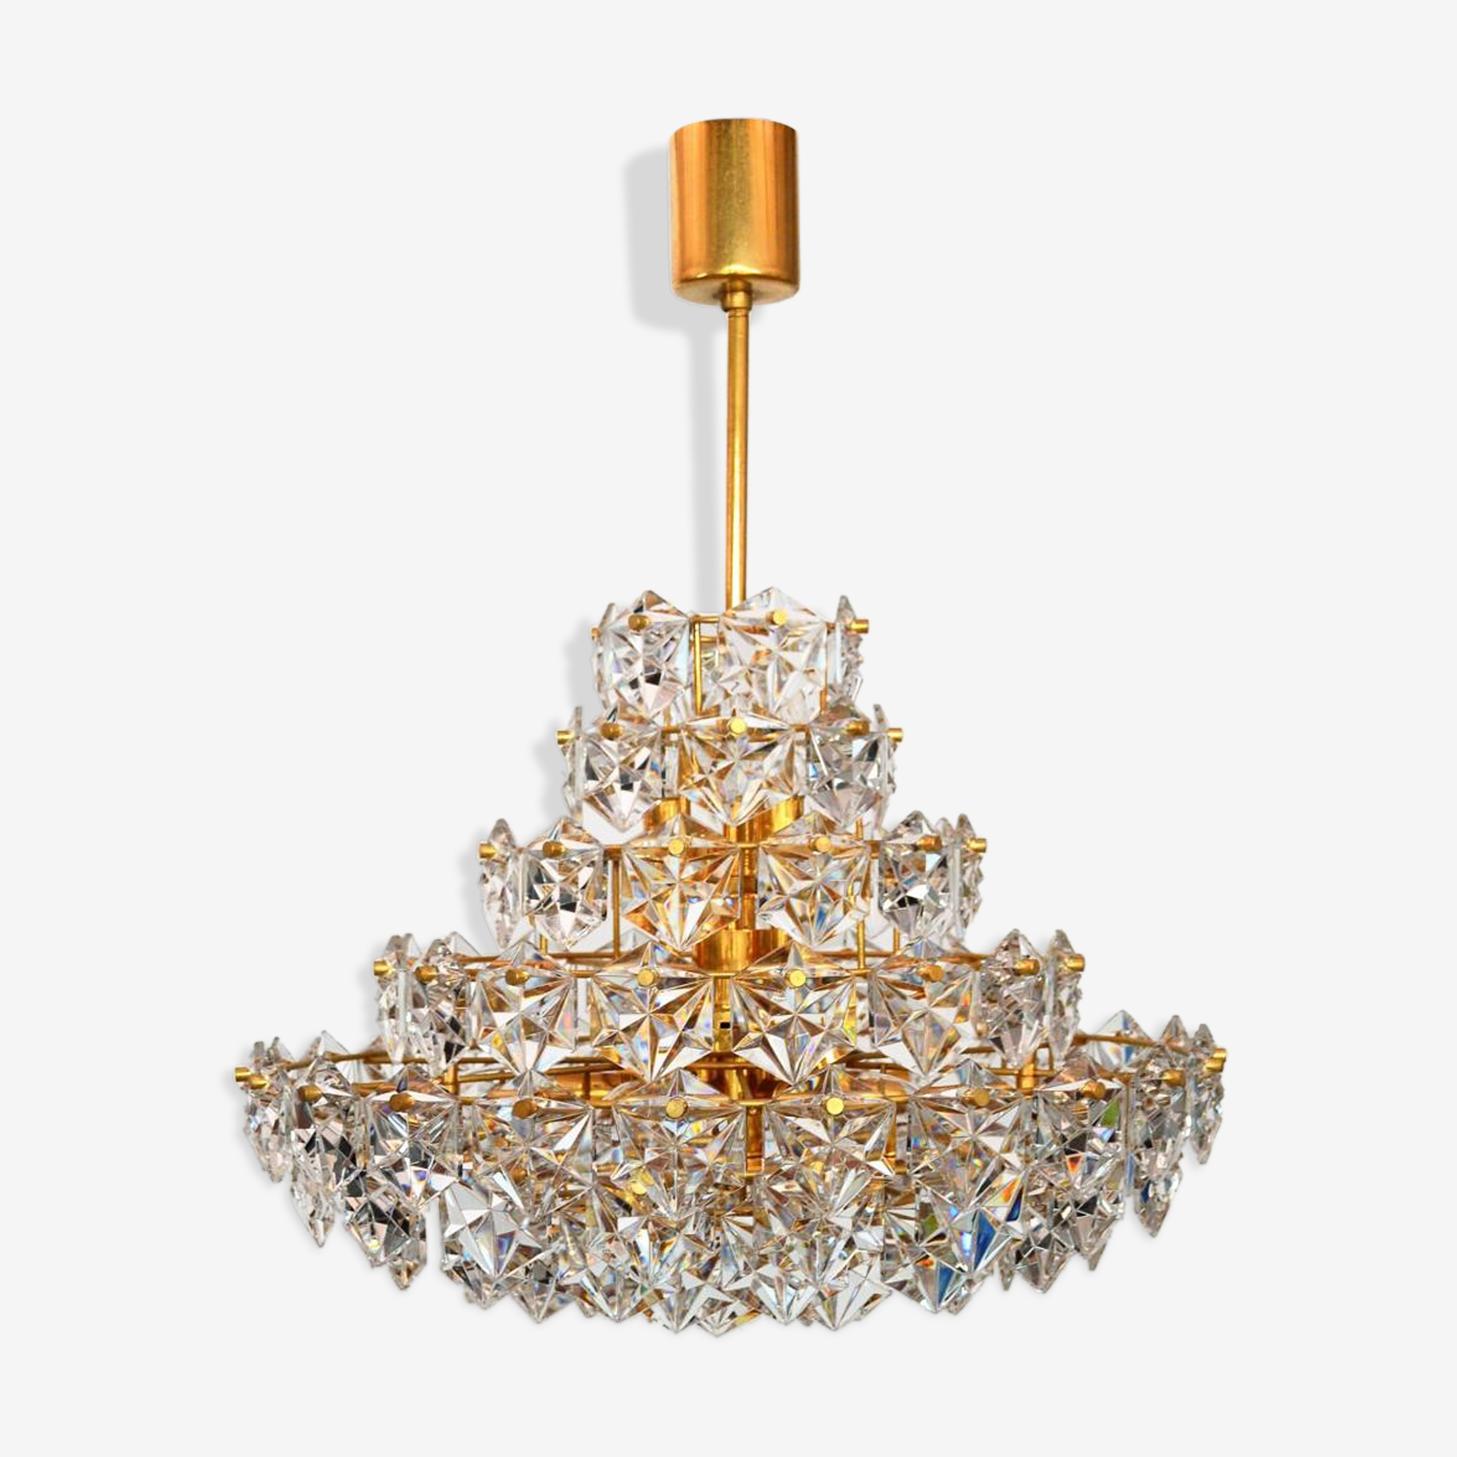 S Kinkeldey 1970 crystal chandelier